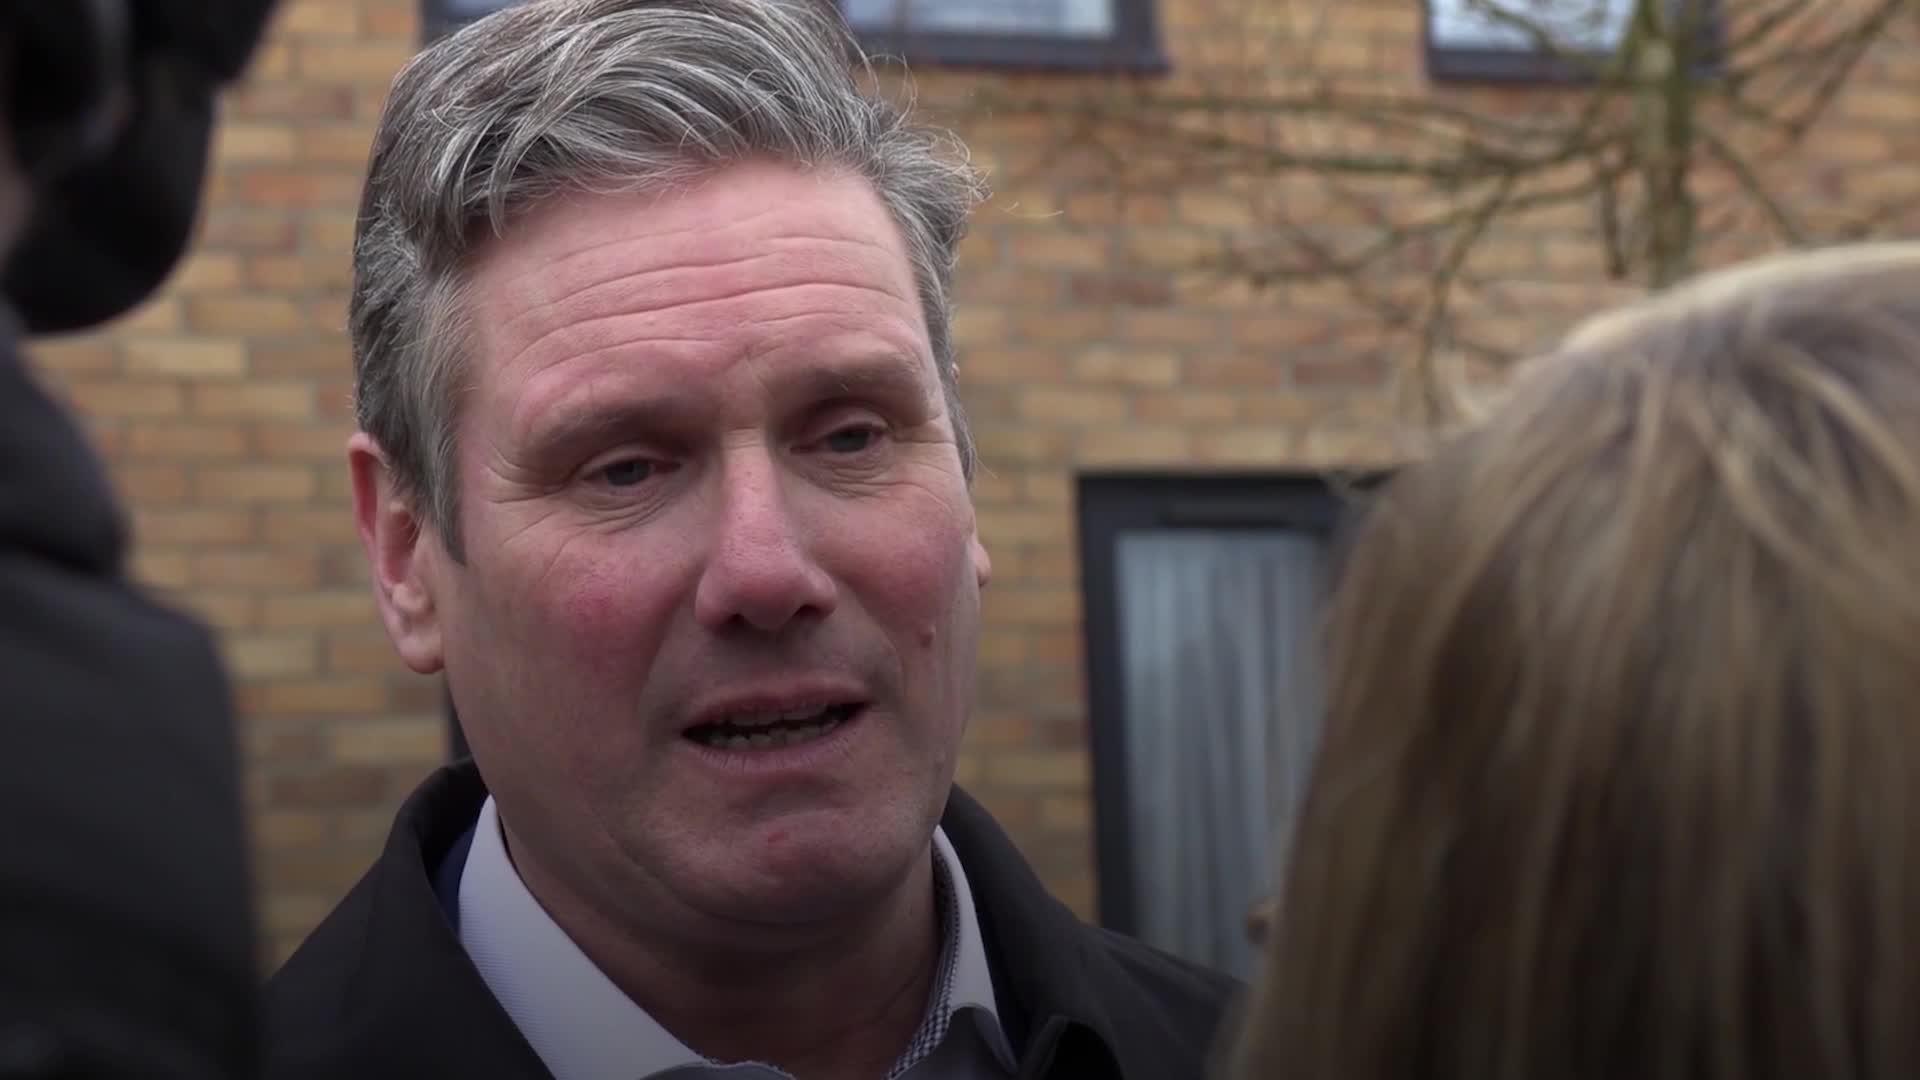 Sir Keir Starmer announced as new Labour leader